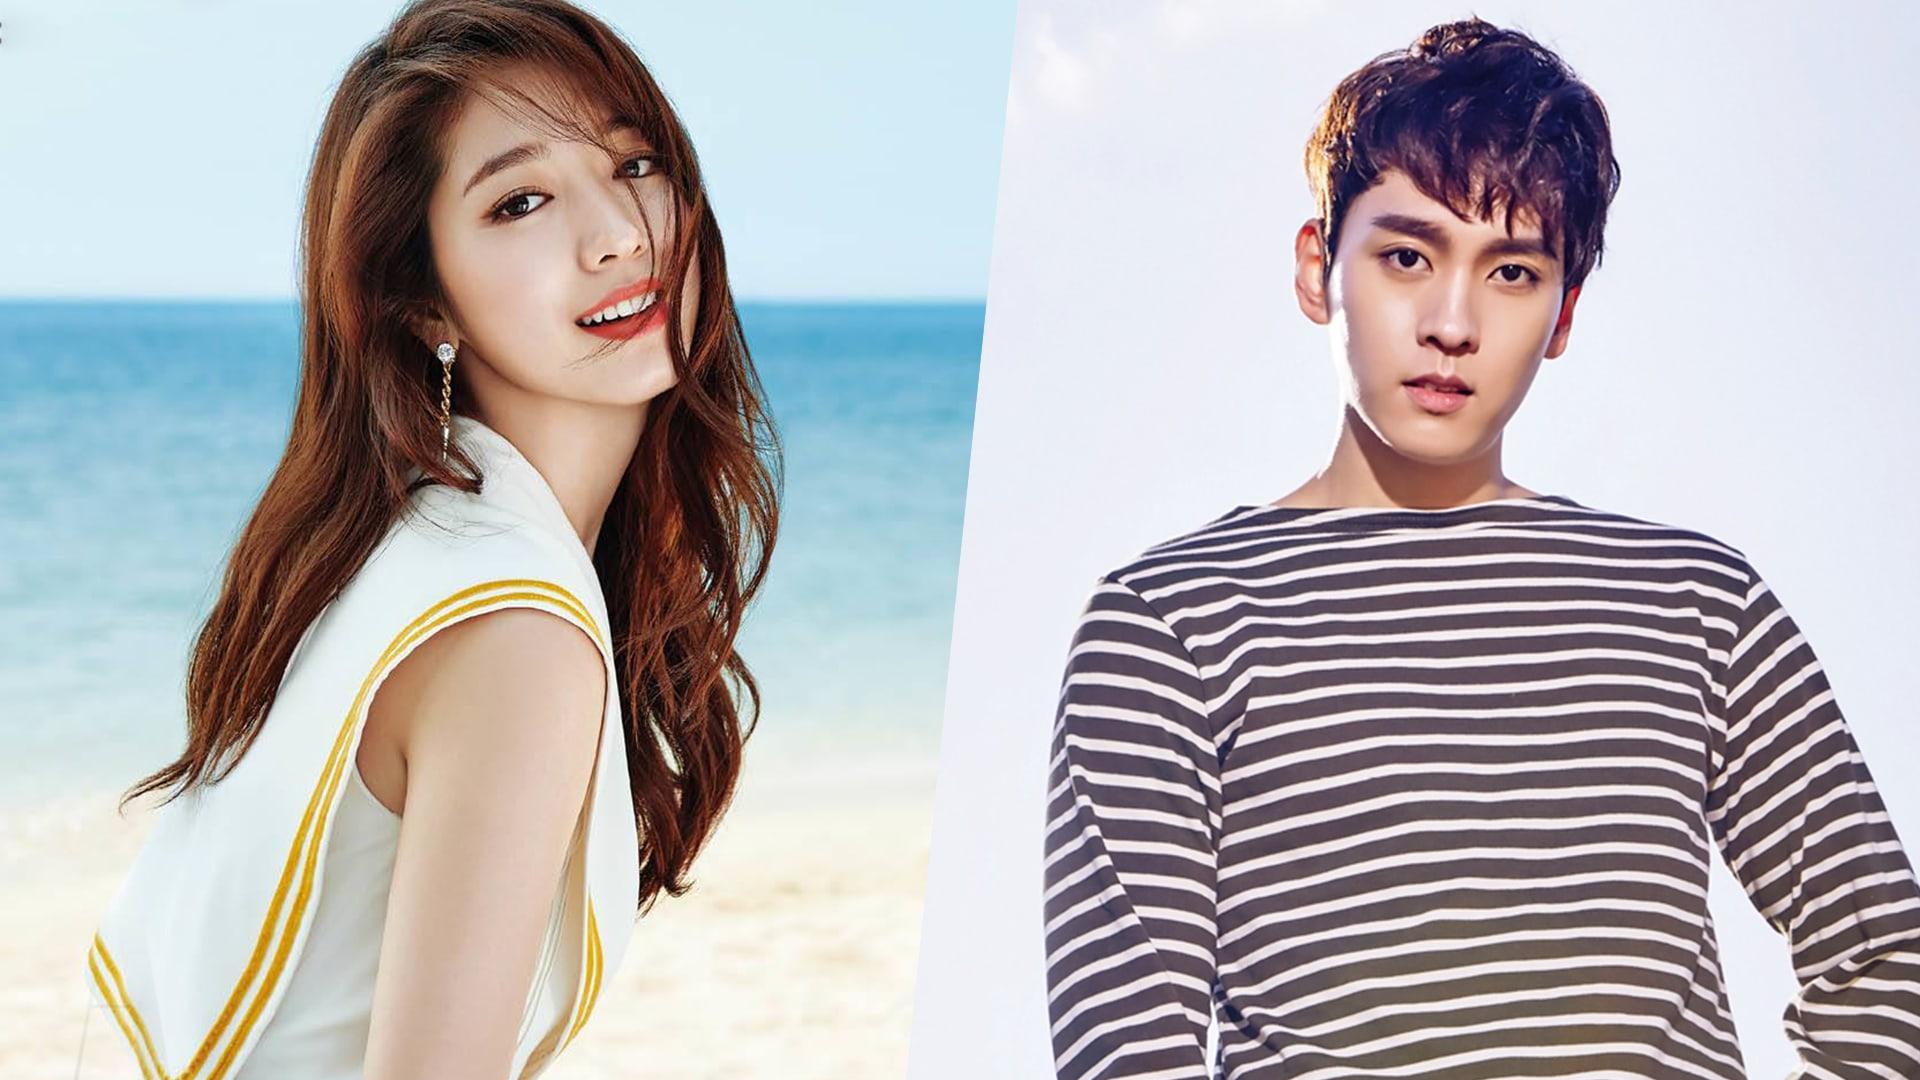 Seo kang joon dating rumors